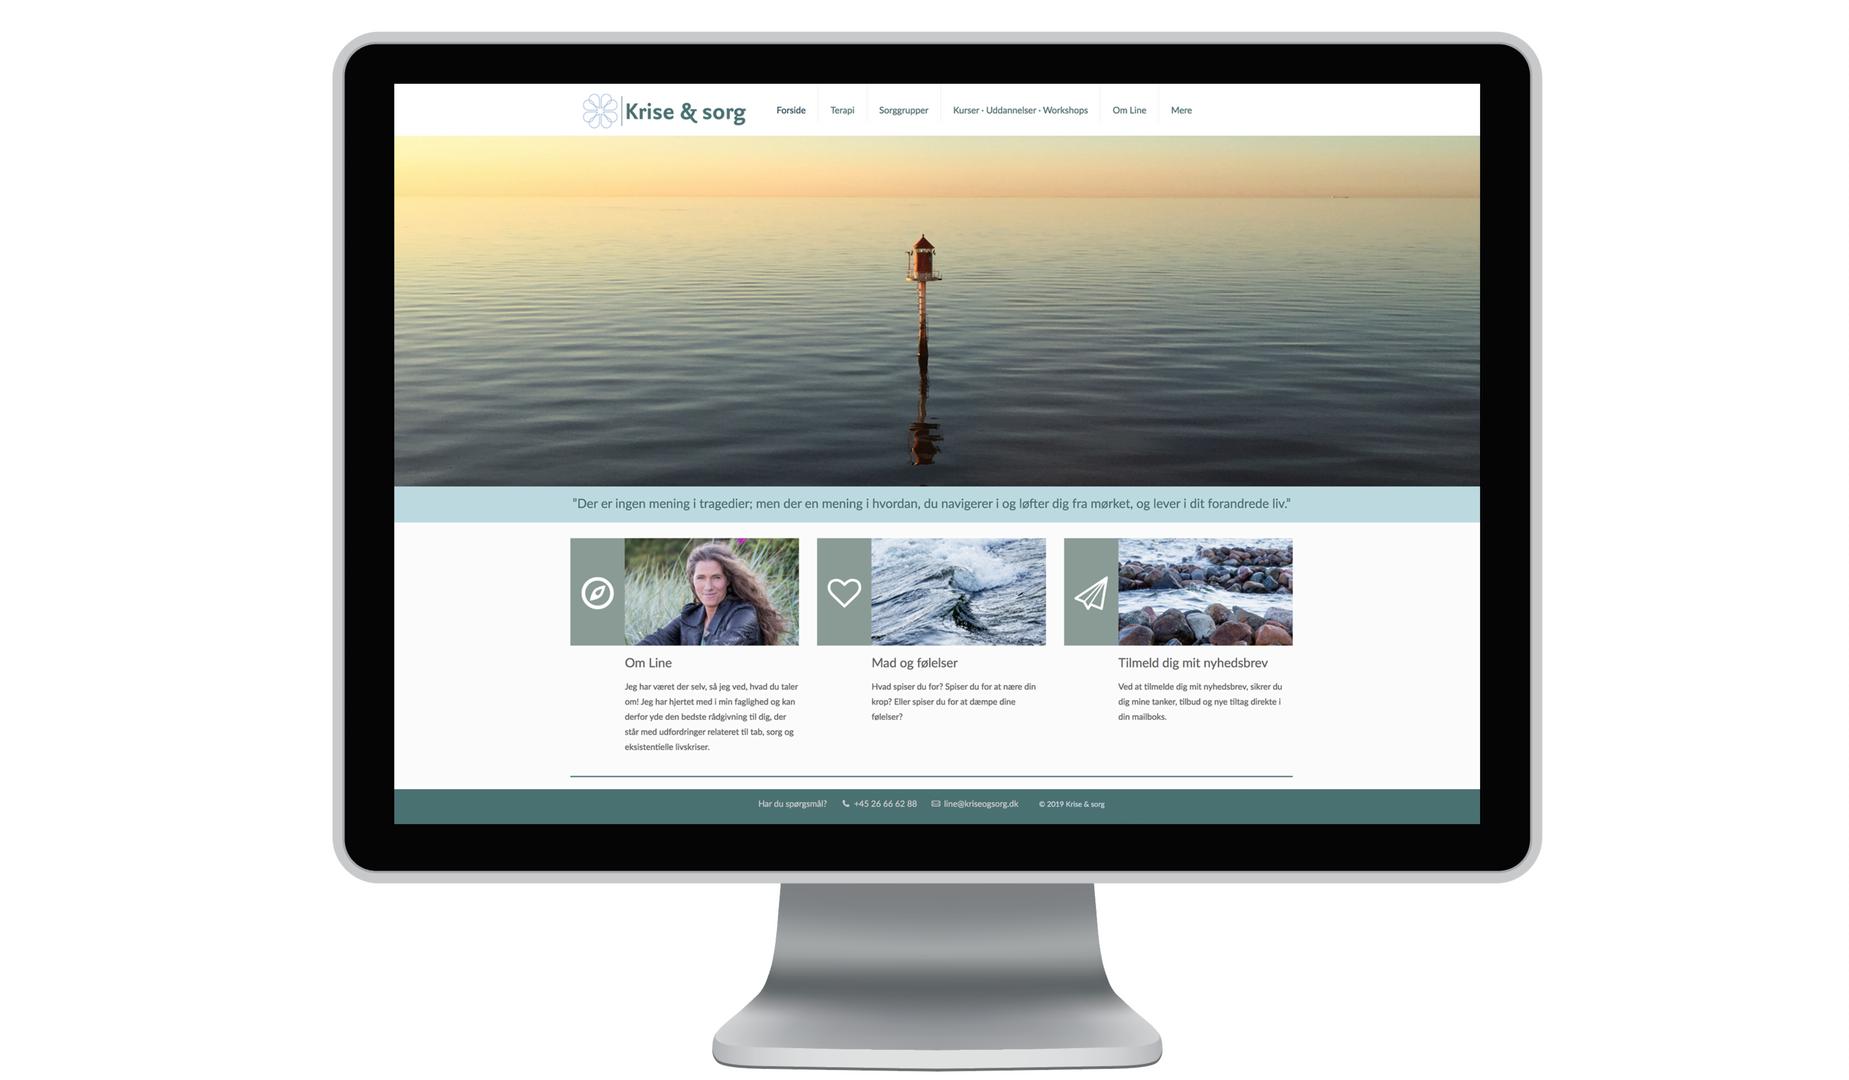 Krise og sorg_website - Wammen Design.pn